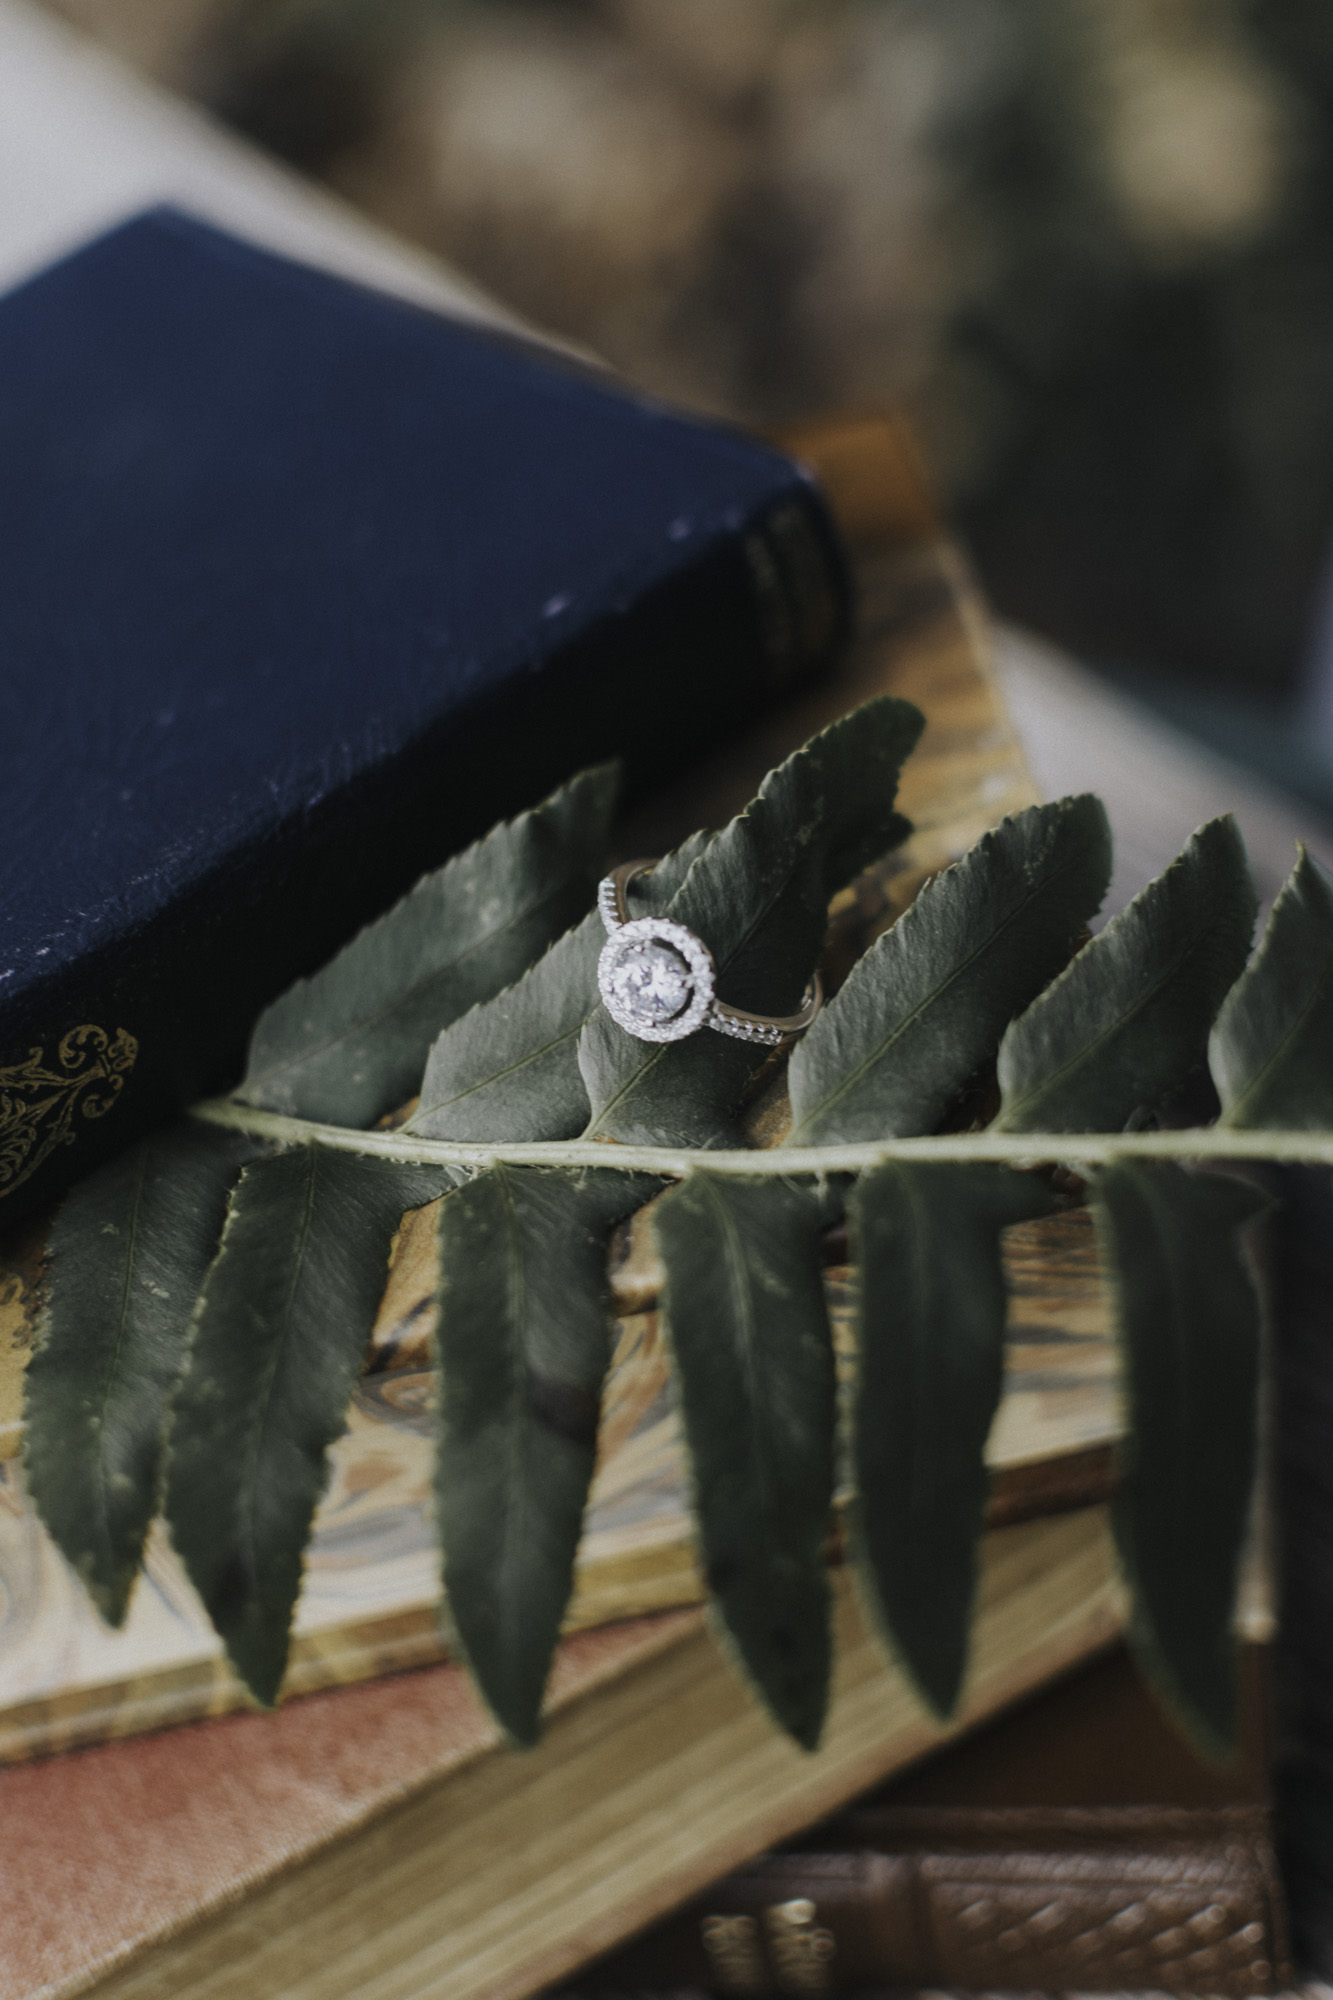 Cate_Ann_Photography_Dayton_Ohio_Wedding_Elopement_And_Engagement_PhotographerDSC_5728.jpg